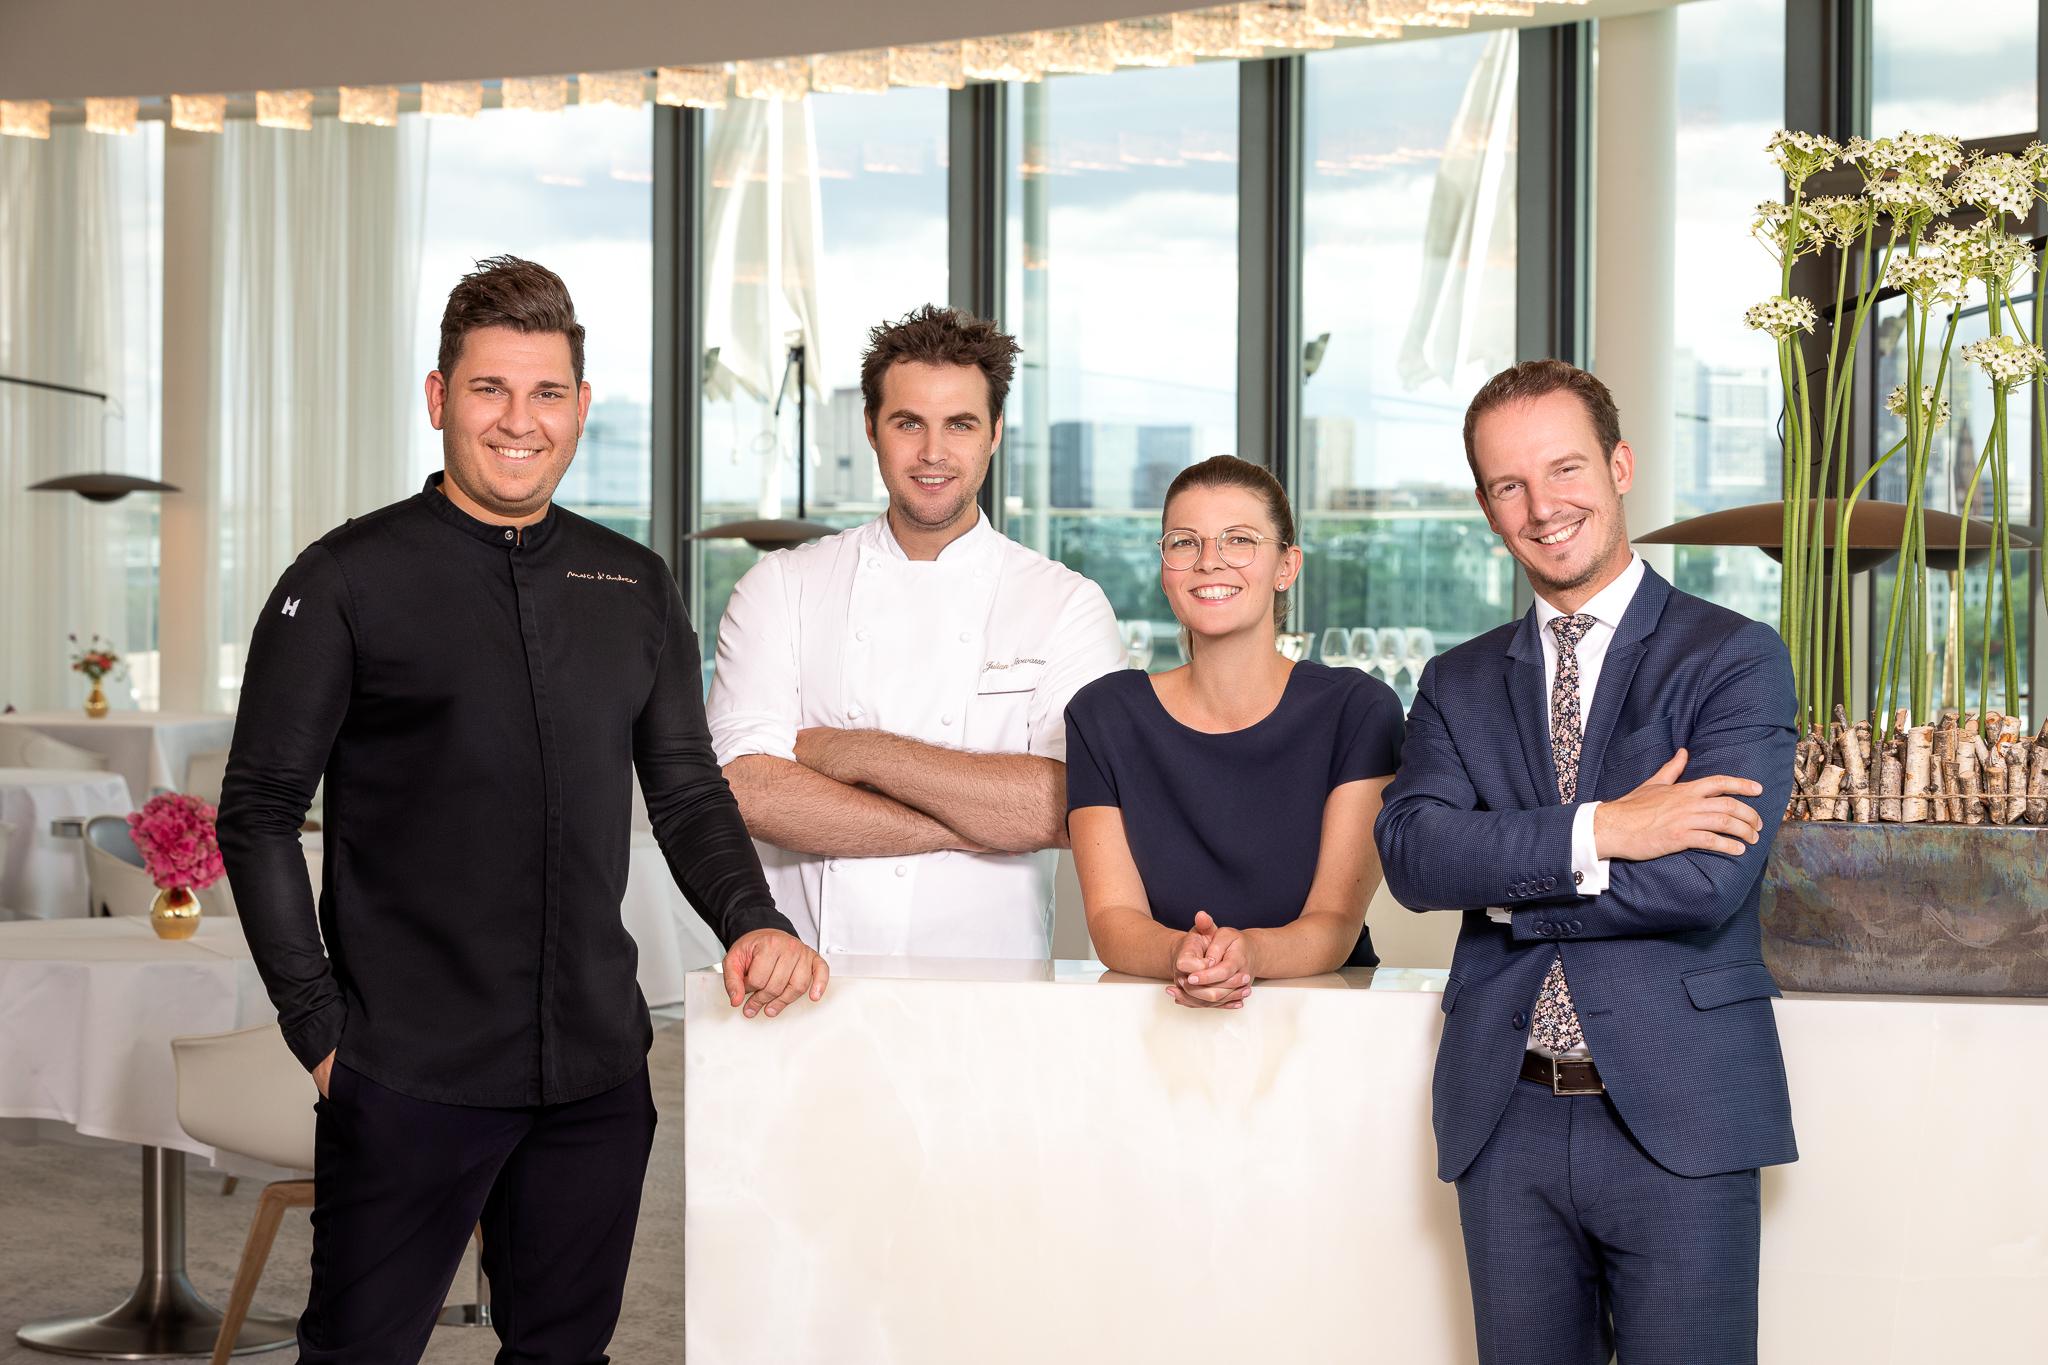 The Fontenay - Lakeside Restaurant - Marco D'Andrea - Julian Stowasser - Stefanie Hehn - Michel Buder